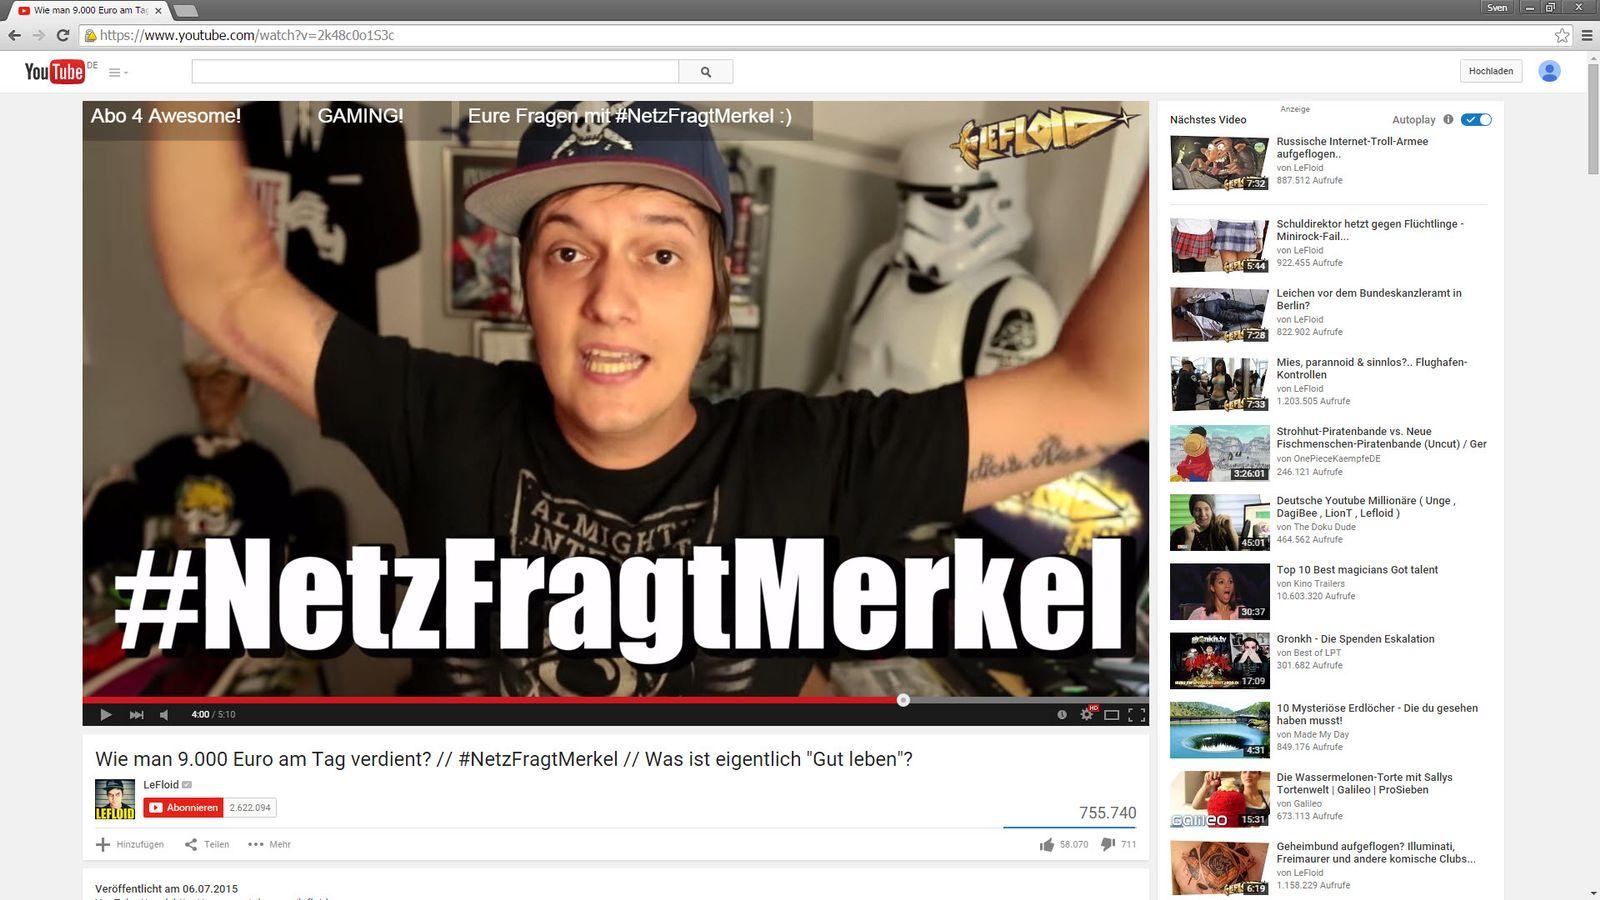 SCREENSHOT YouTube - LeFLoid - NetzFragtMerkel